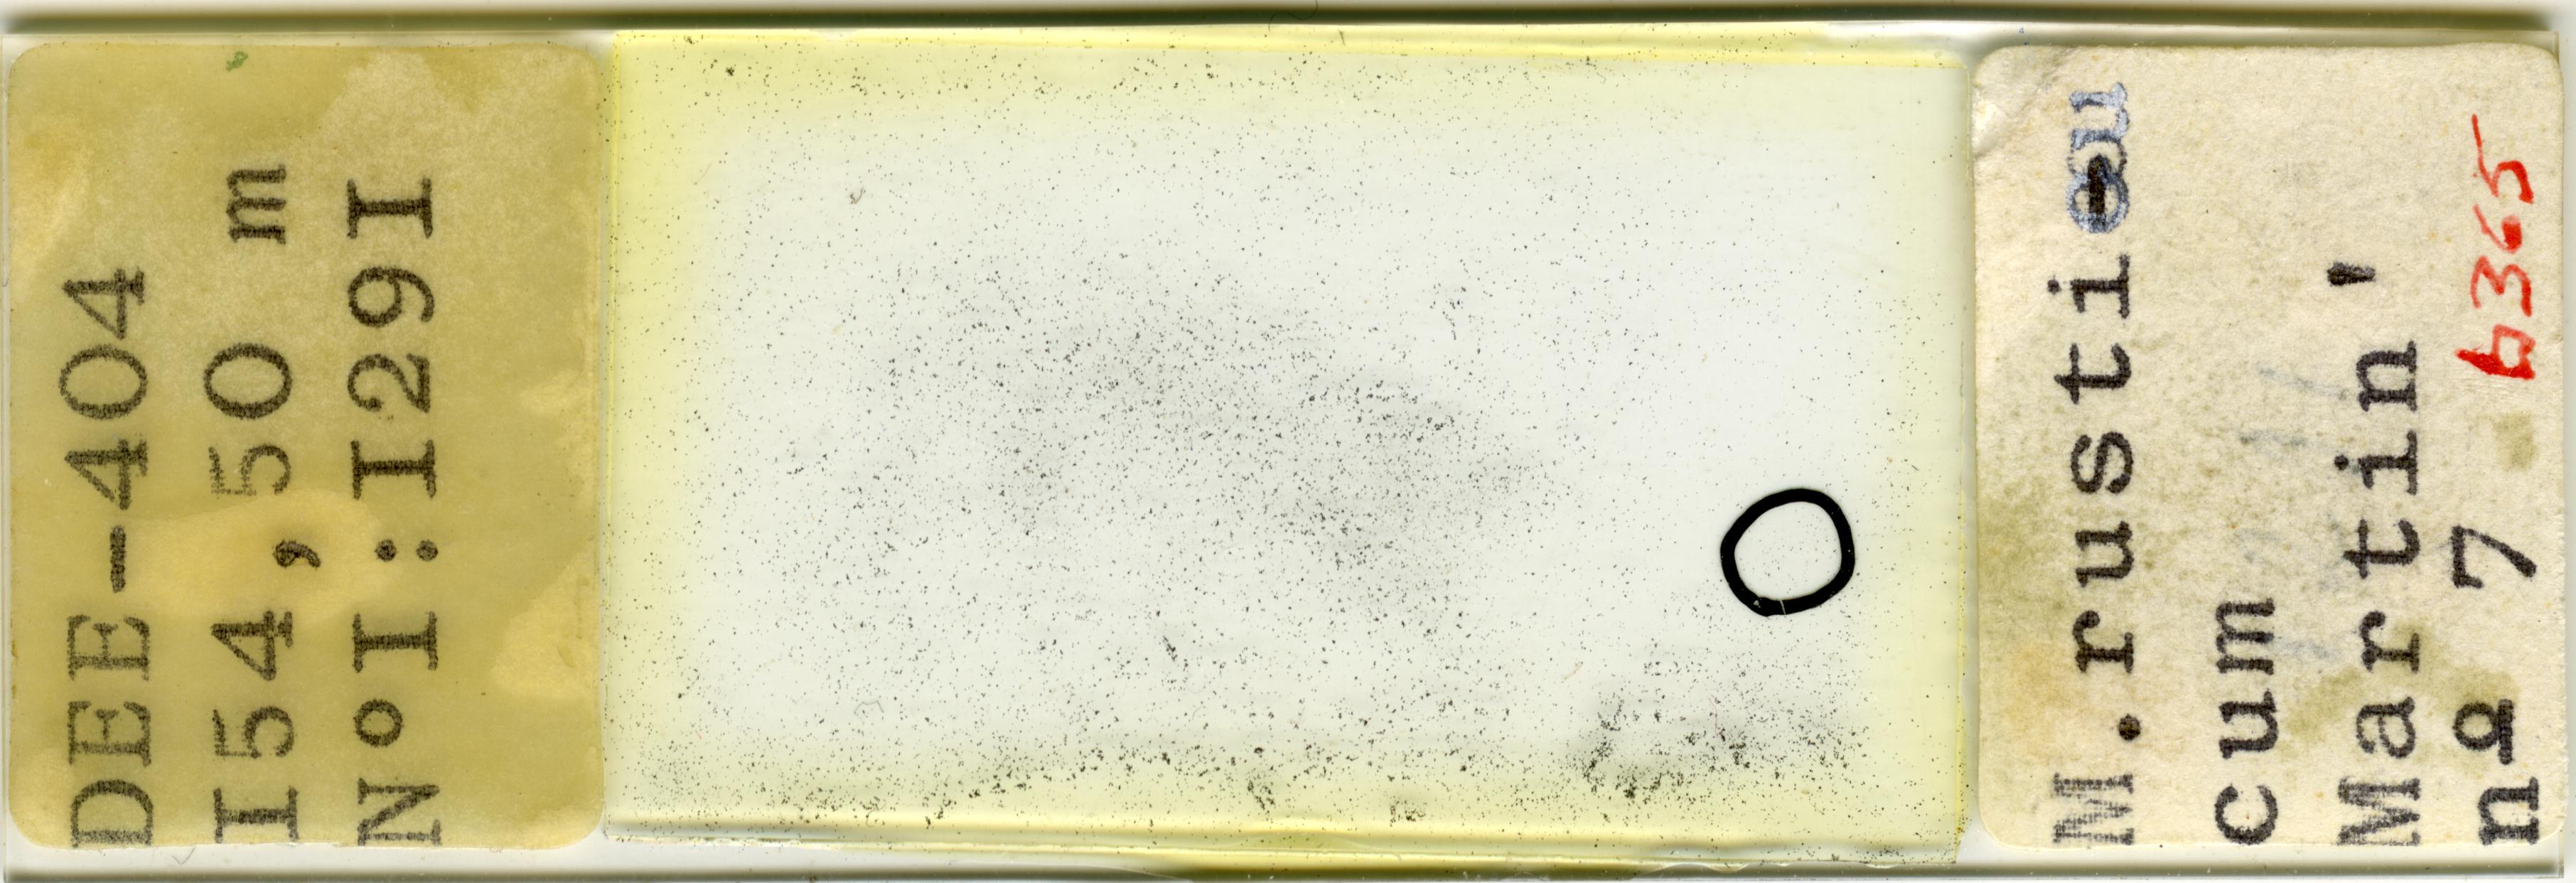 Lame n°DEE-404 I5O, 50 m N° I : I29I - M. rusticum Martin ' n° 7 b 365